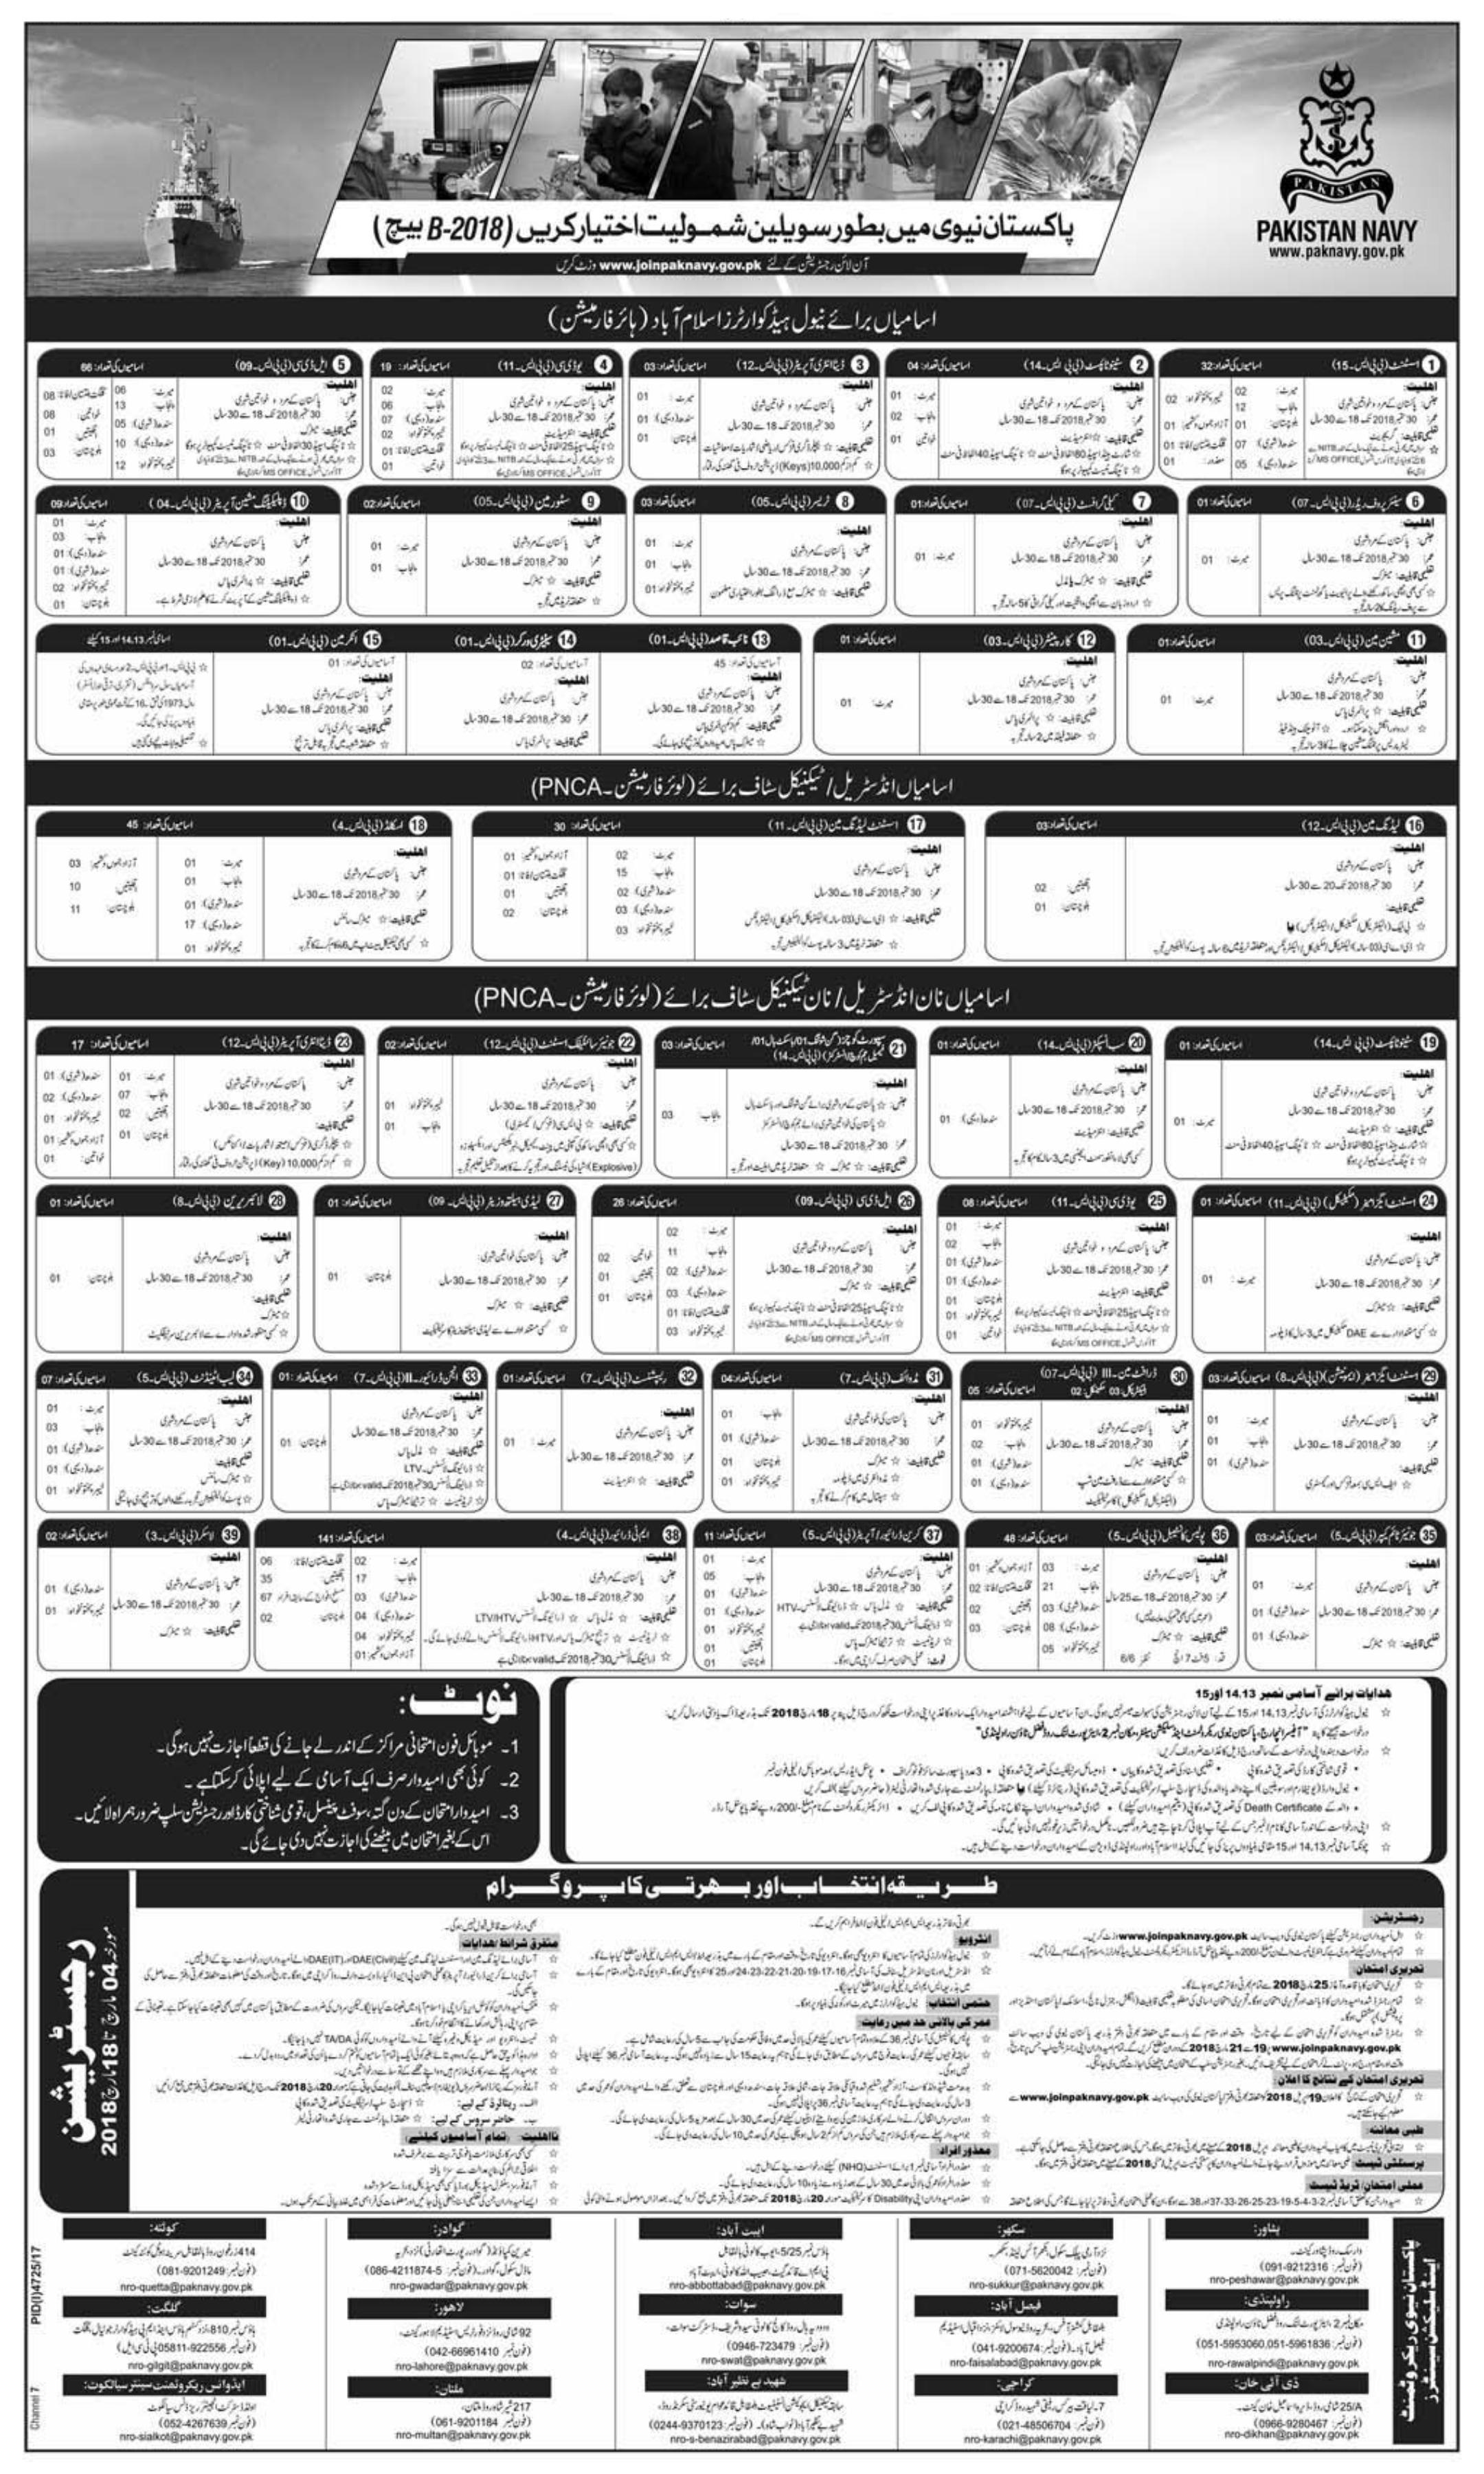 Join Pak Navy As Civilian 2018 Apply Online Registration Form Date